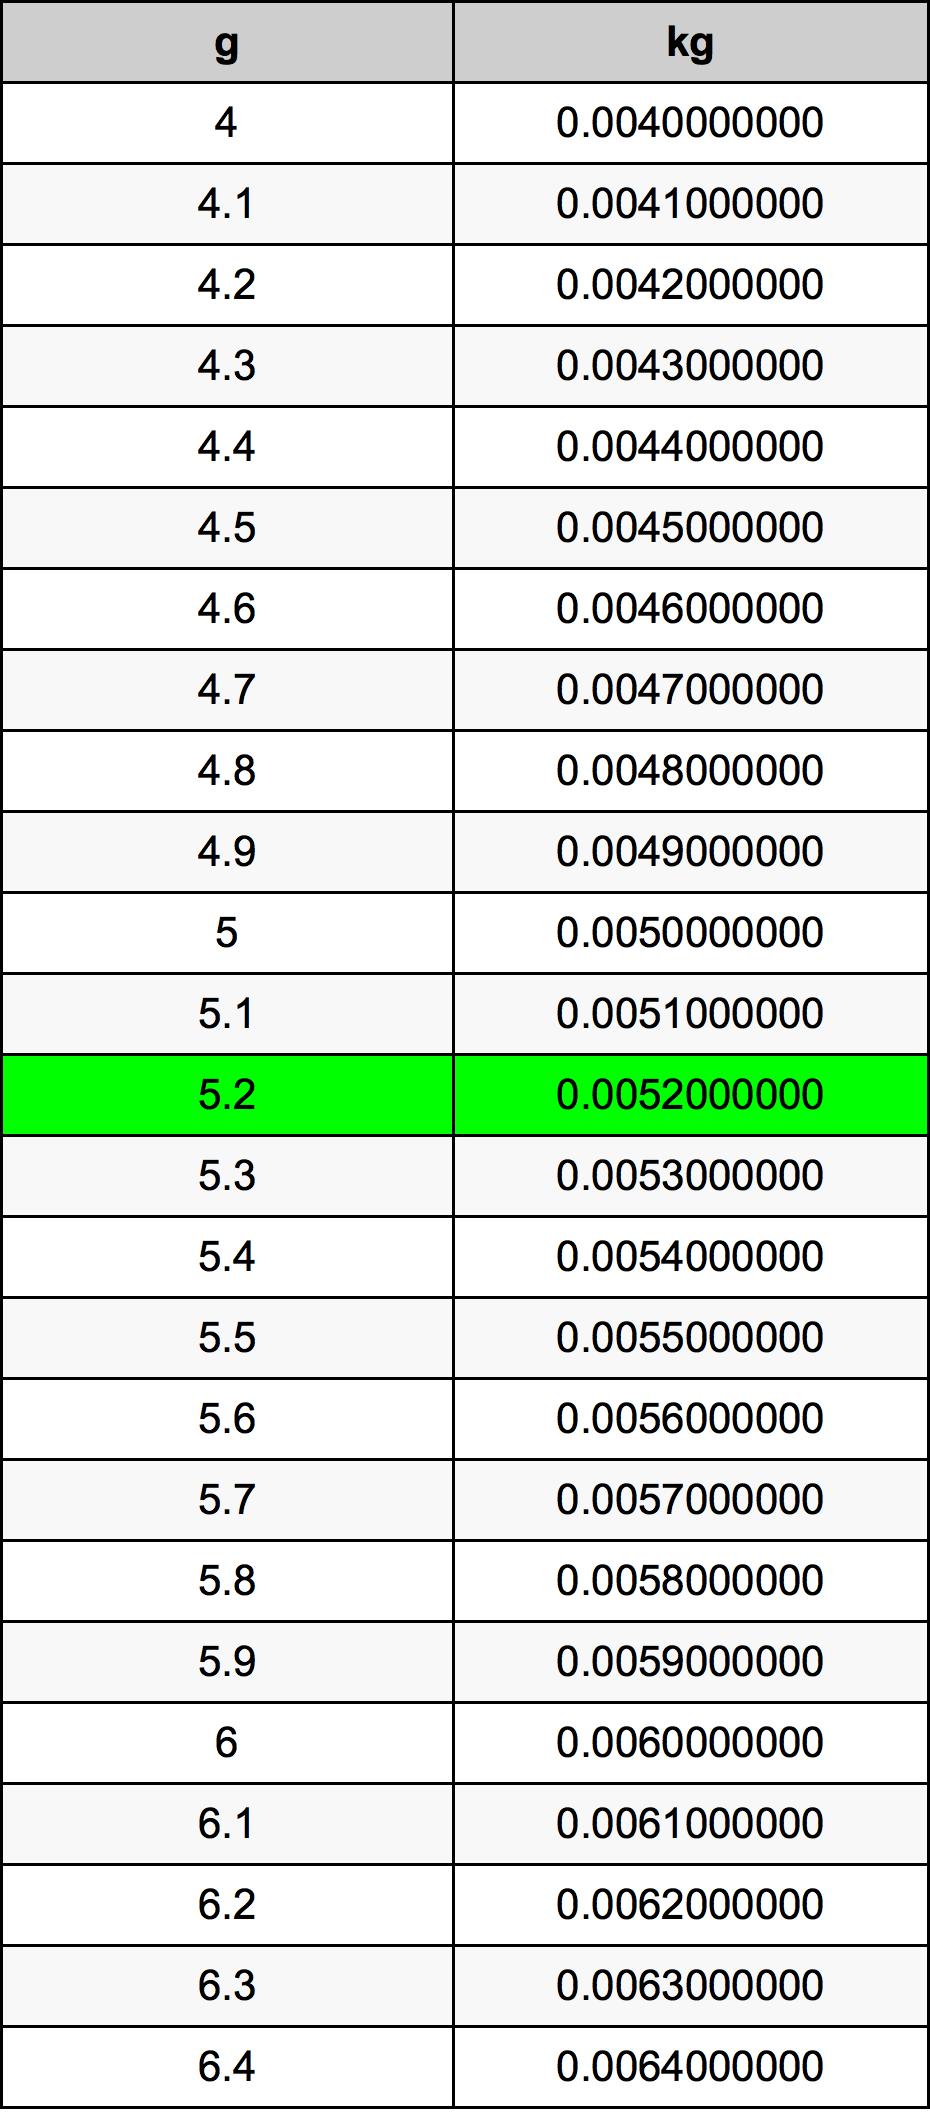 5.2 Grams To Kilograms Converter | 5.2 g To kg Converter